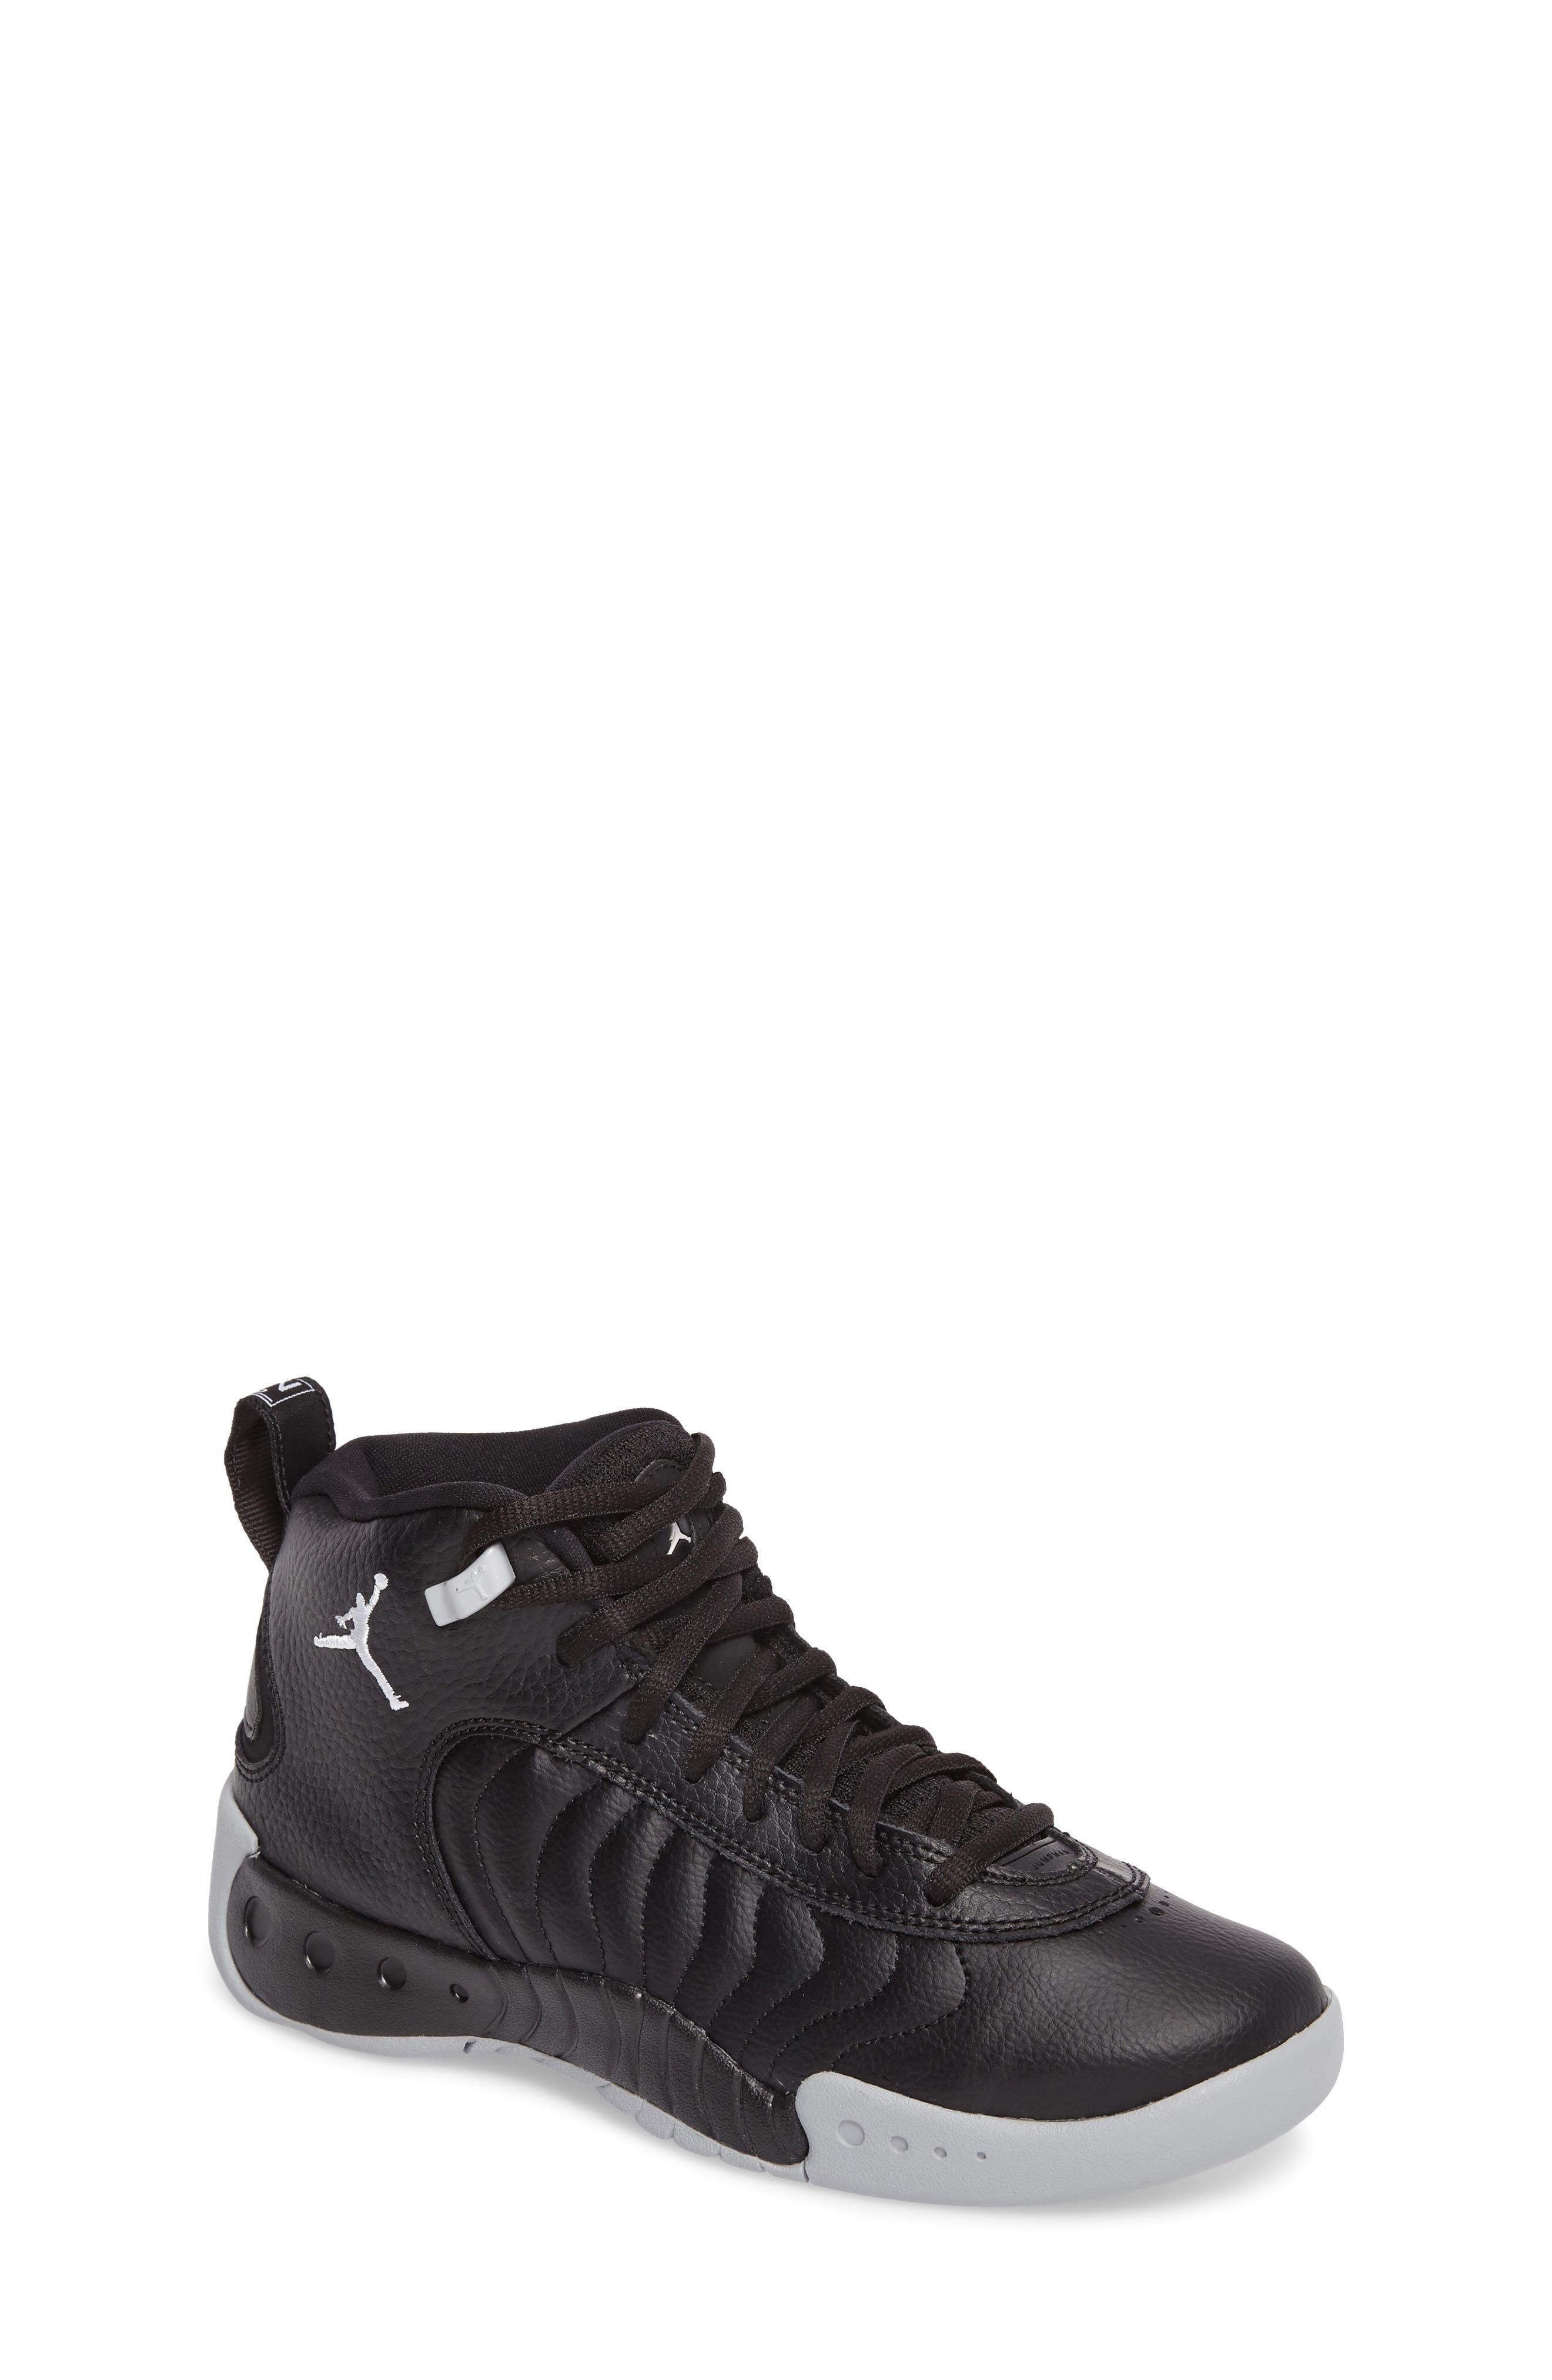 Jordan Jumpman Pro BG Mid Top Sneaker,                             Main thumbnail 1, color,                             Black/ White-Wolf Grey